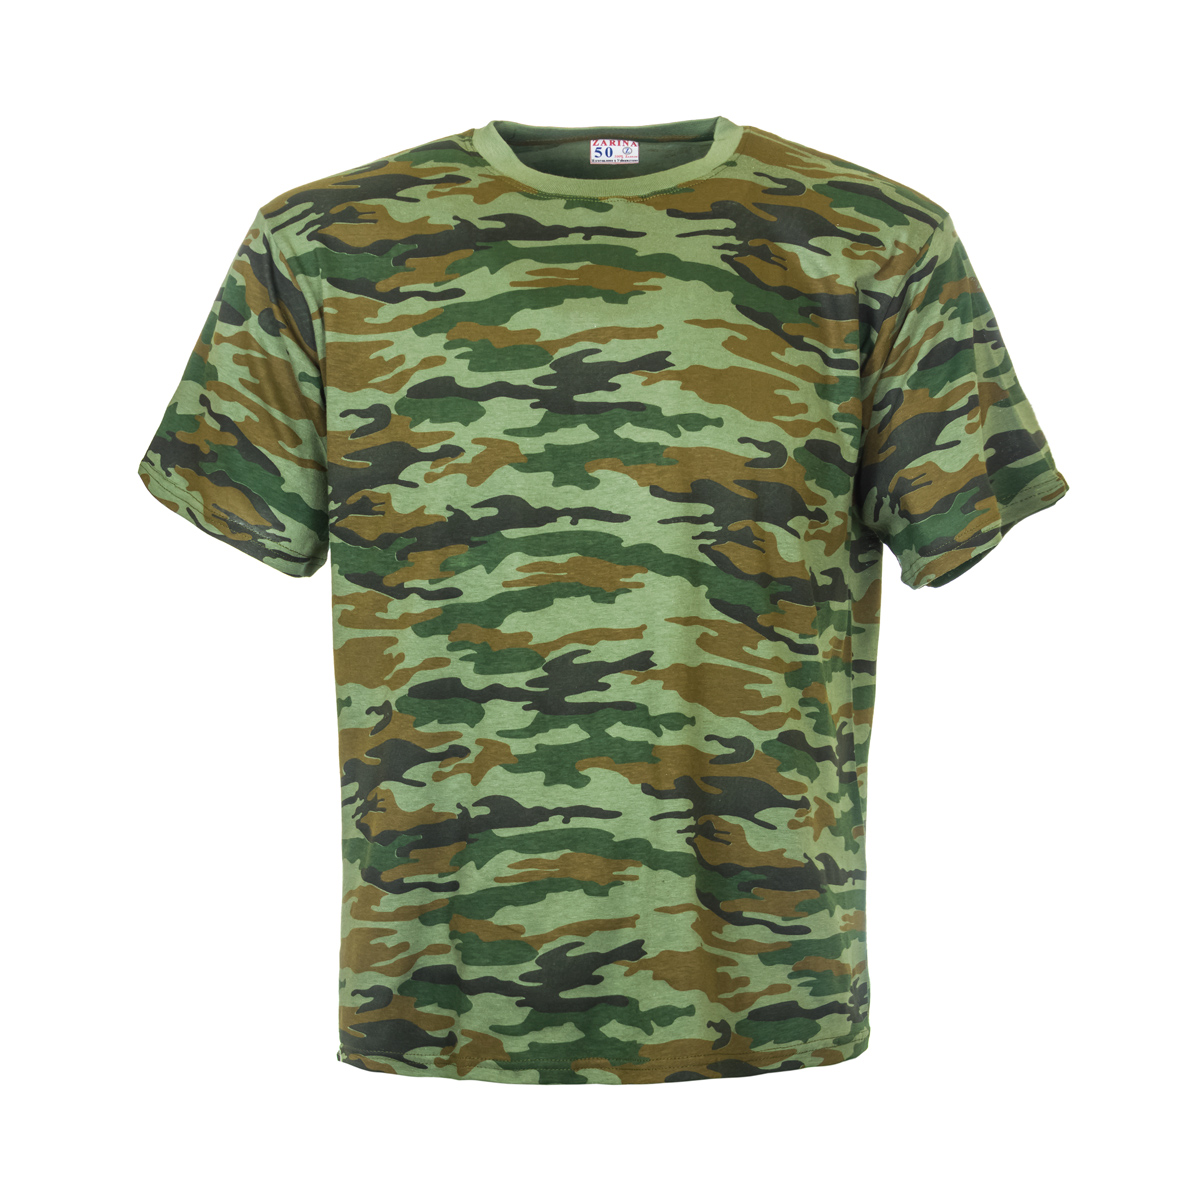 Муж. футболка Камуфляж р. 48Майки и футболки<br>Фактический ОГ:90 см<br>Фактический ОТ:90 см<br>Фактический ОБ:96 см<br>Длина по спинке:68 см<br>Рост:172-180 см<br><br>Тип: Муж. футболка<br>Размер: 48<br>Материал: Кулирка